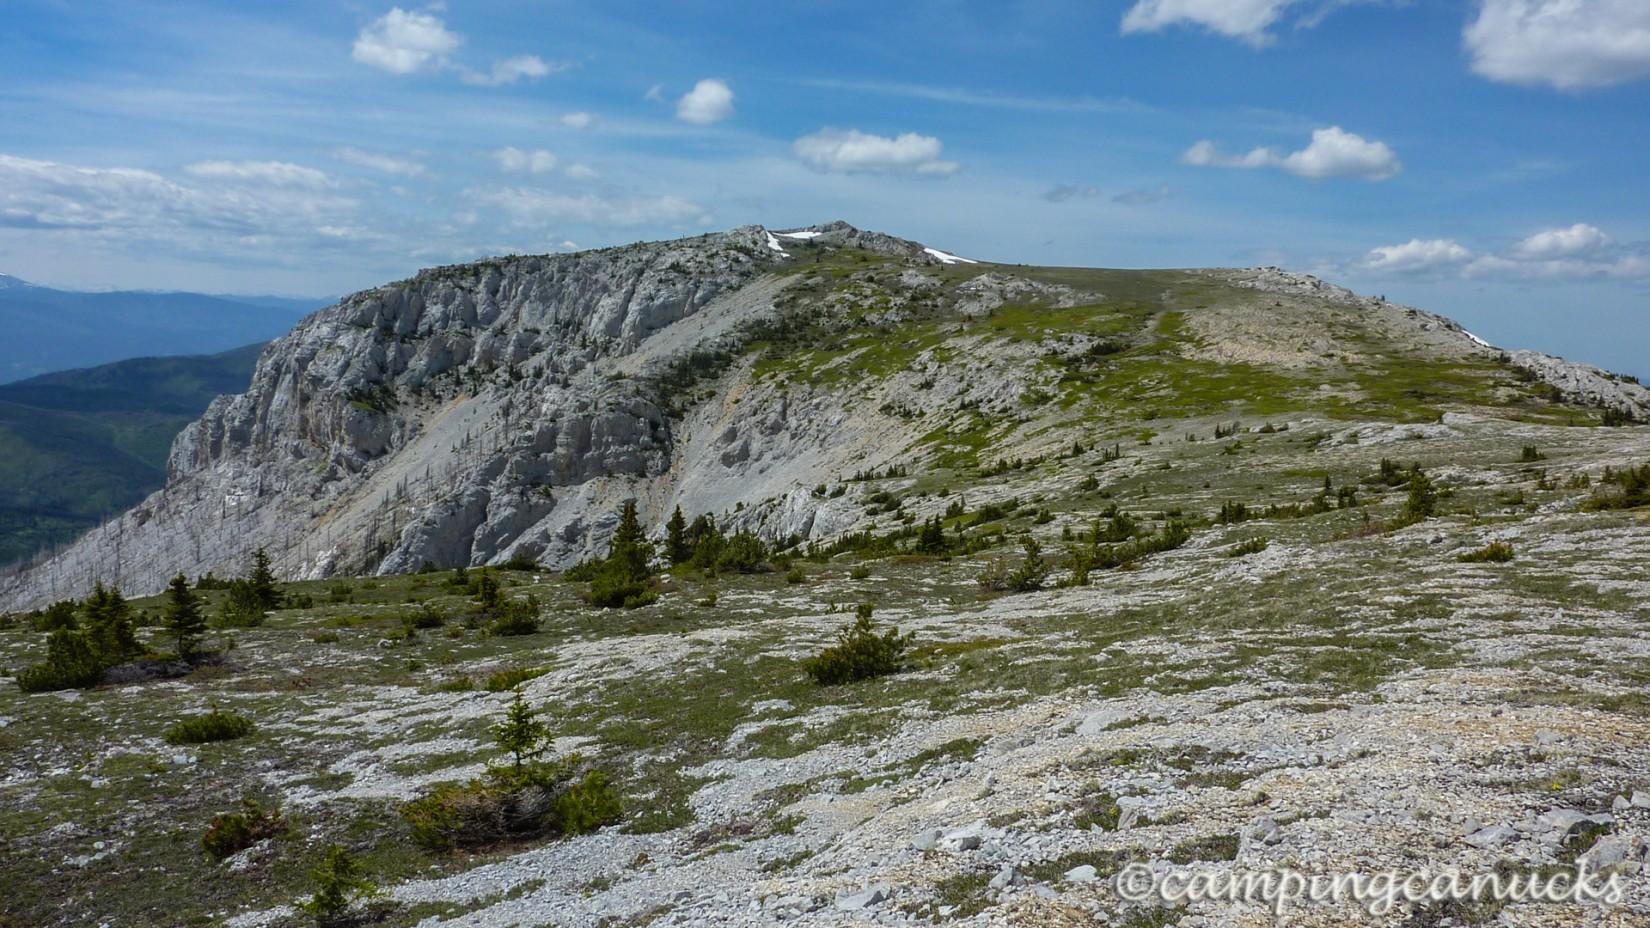 The saddle between ridges